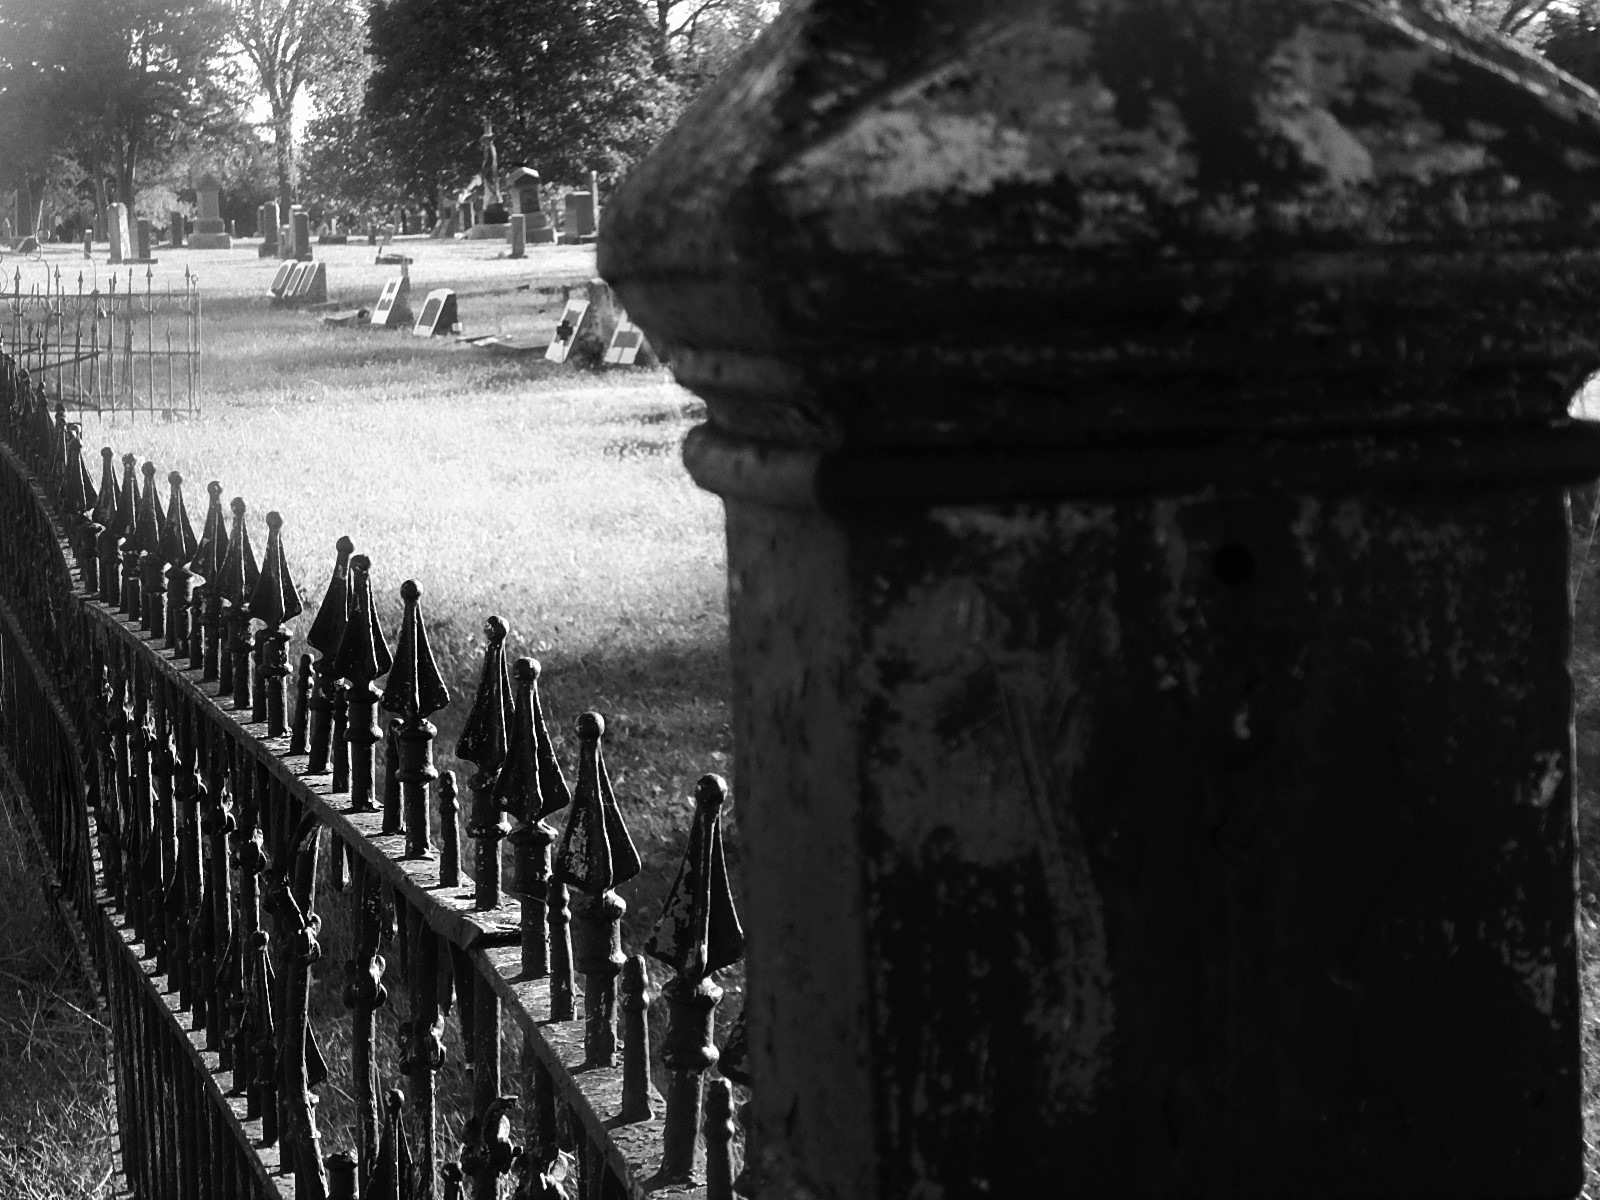 Cemetery by Marsha Furman